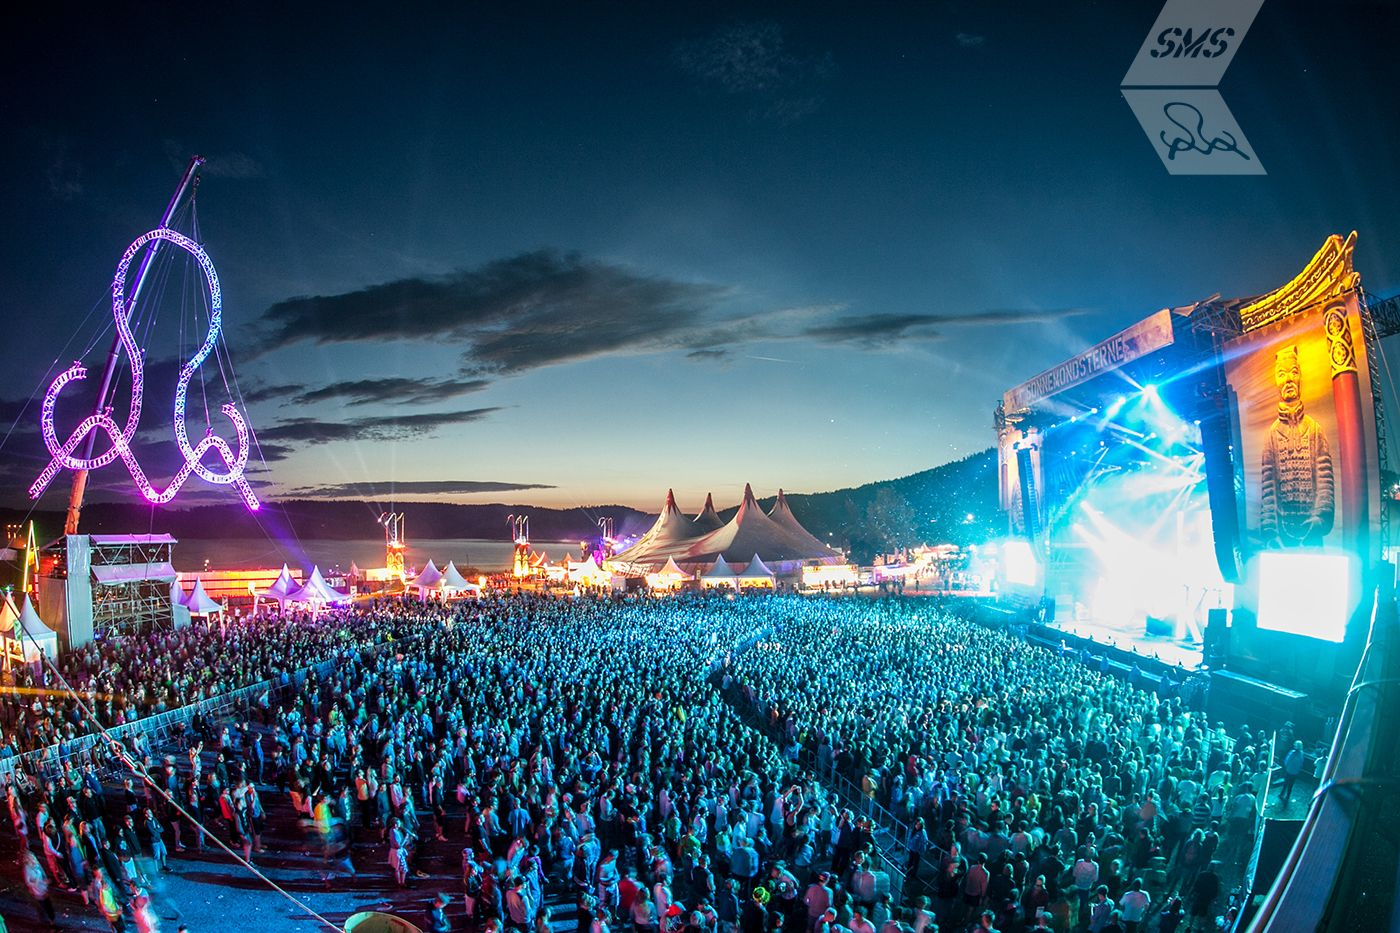 SonneMondSterne Festival verkündet erste Namen für 2016